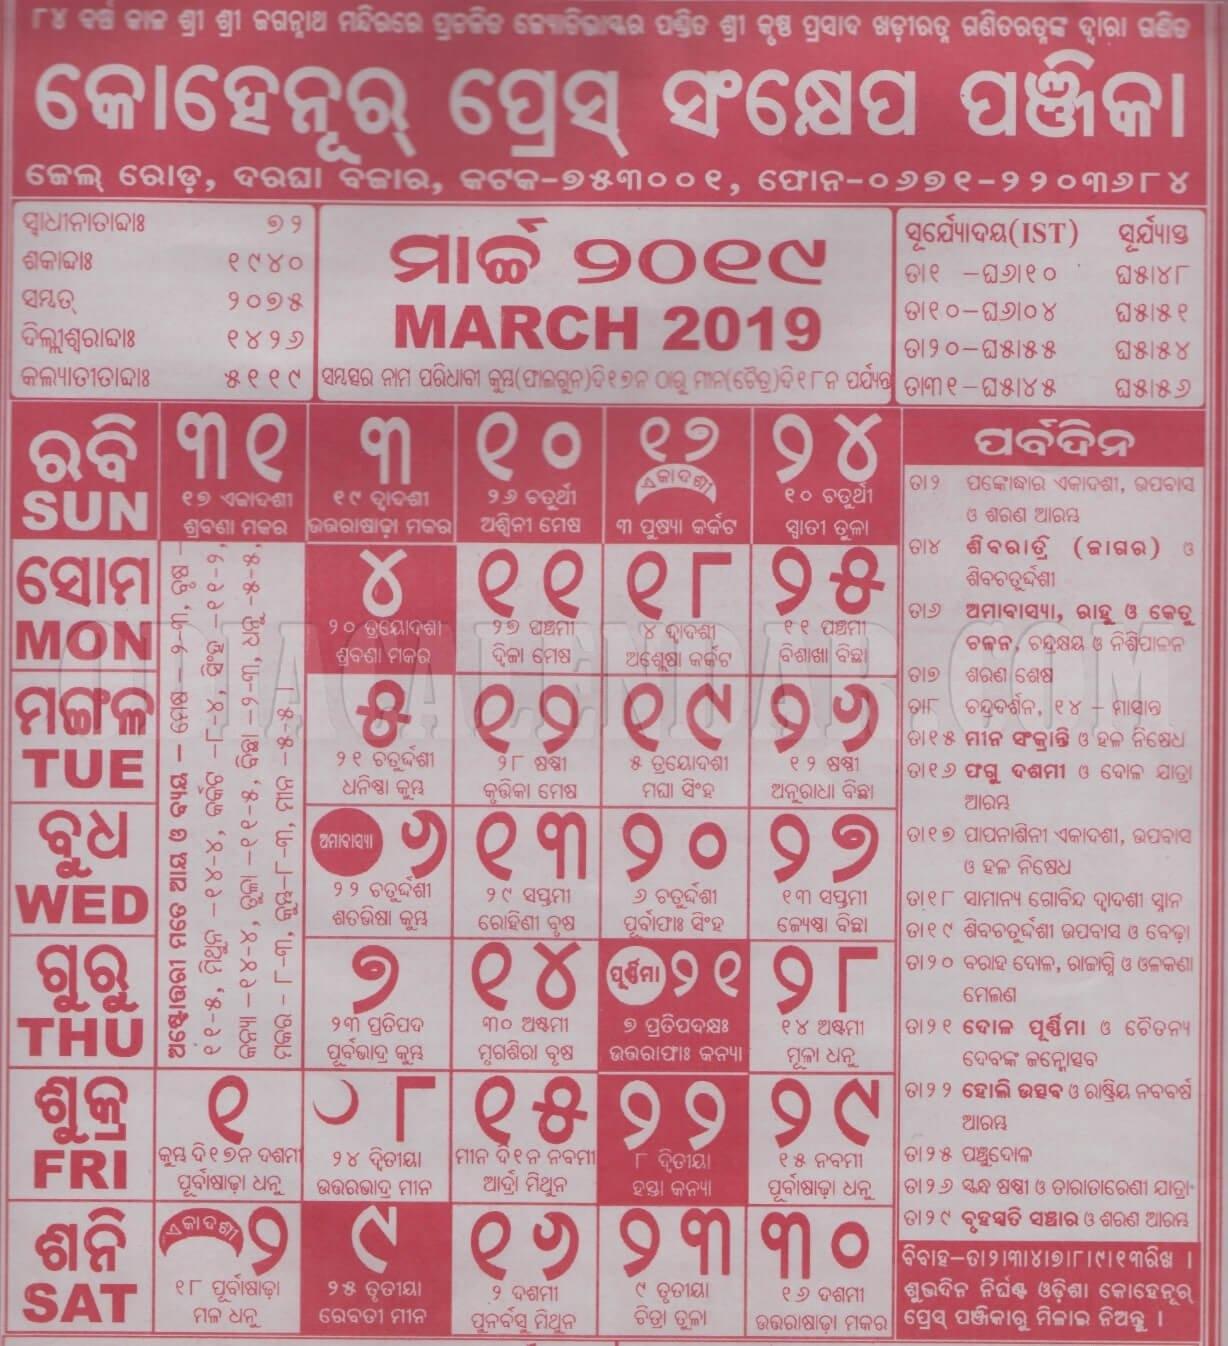 Odia Kohinoor Calendar 2019 March View And Download Free Calendar 2019 Kohinoor